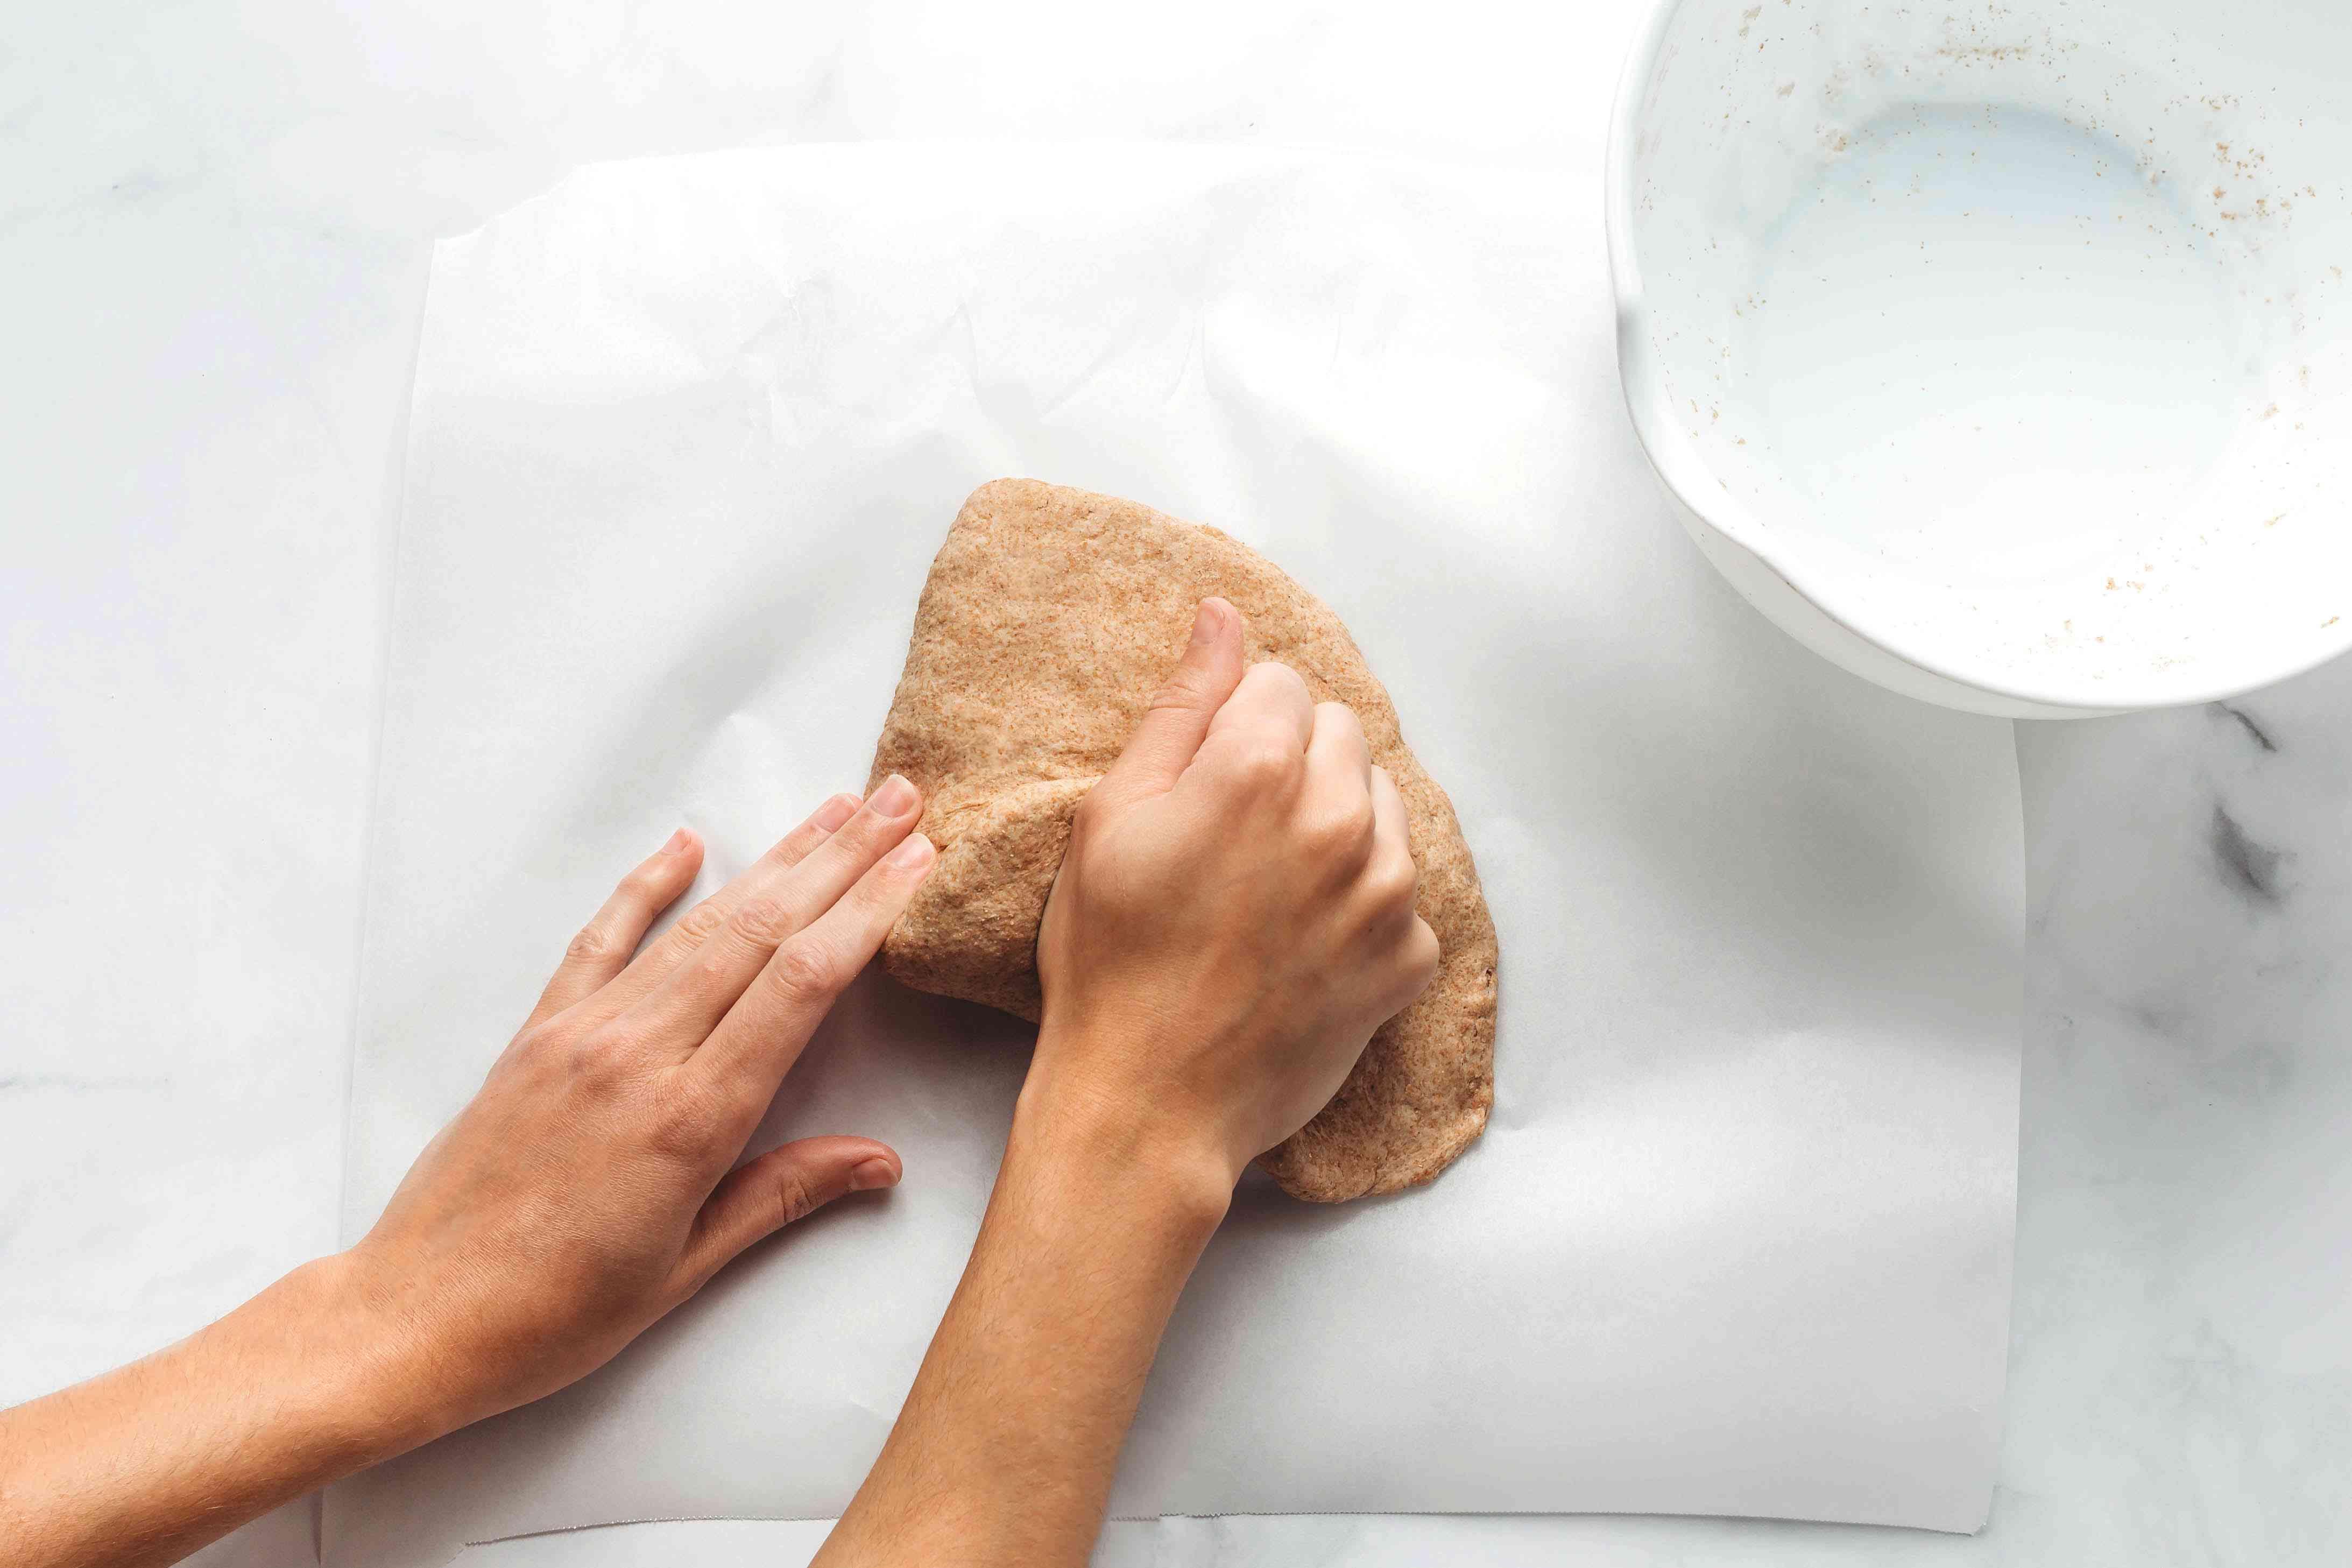 Kneading poori dough on parchment paper